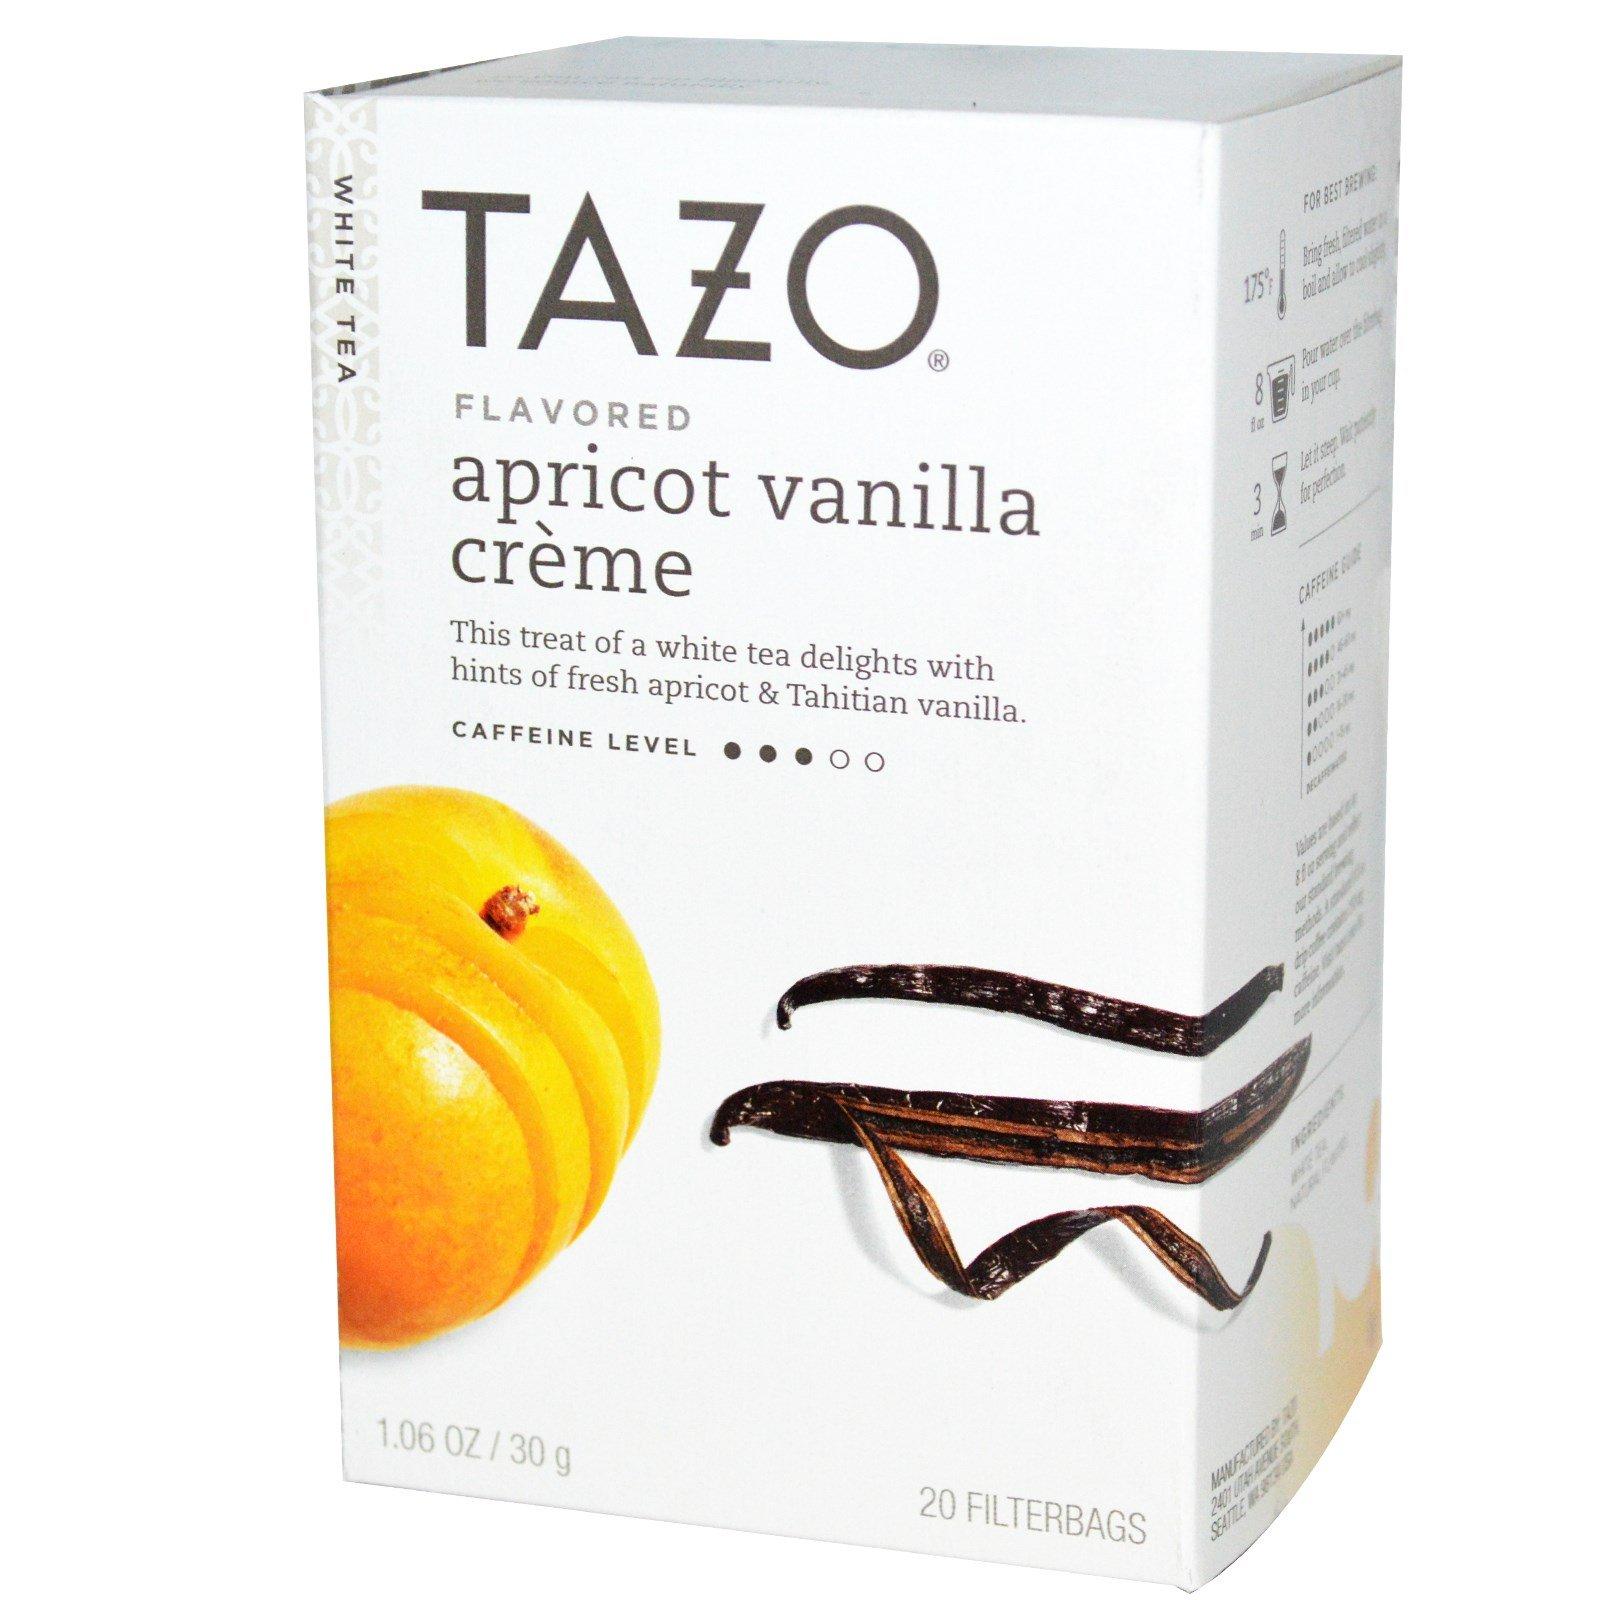 Tazo Teas, Apricot Vanilla Crème Flavored, White Tea, 20 Filterbags, 1.06 oz (30 g) - 3PC